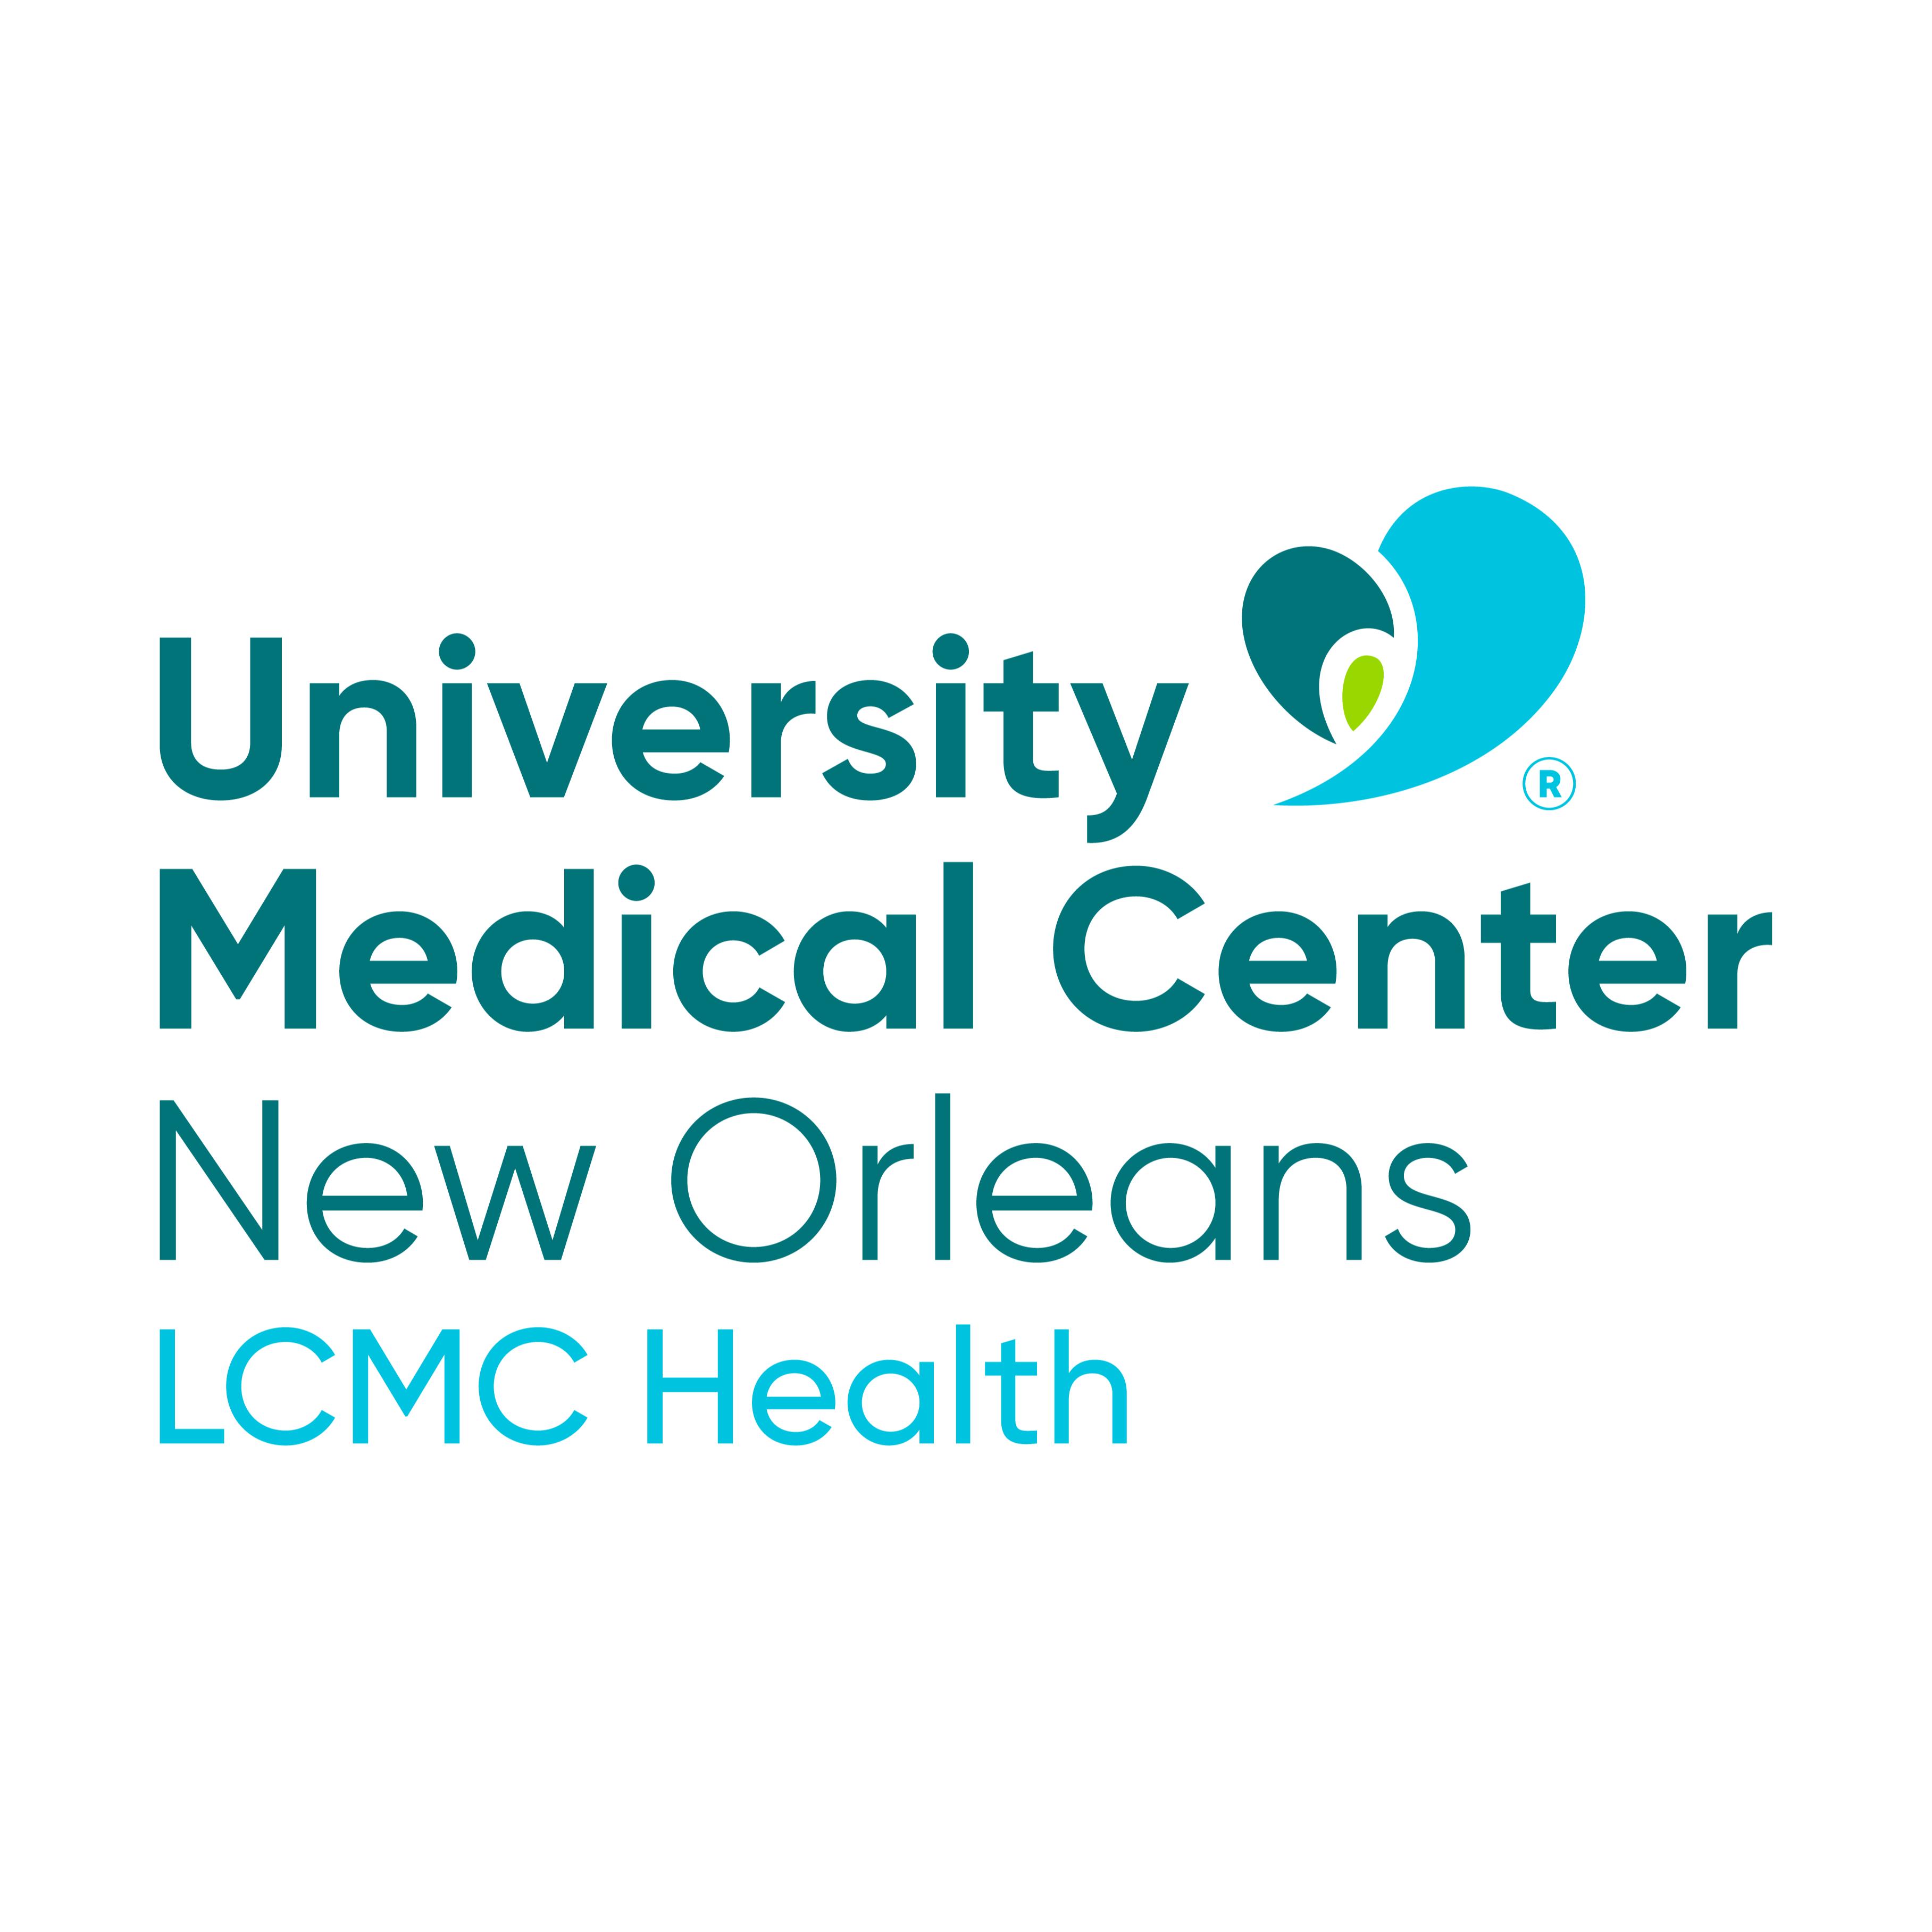 University Medical Center New Orleans Emergency Room